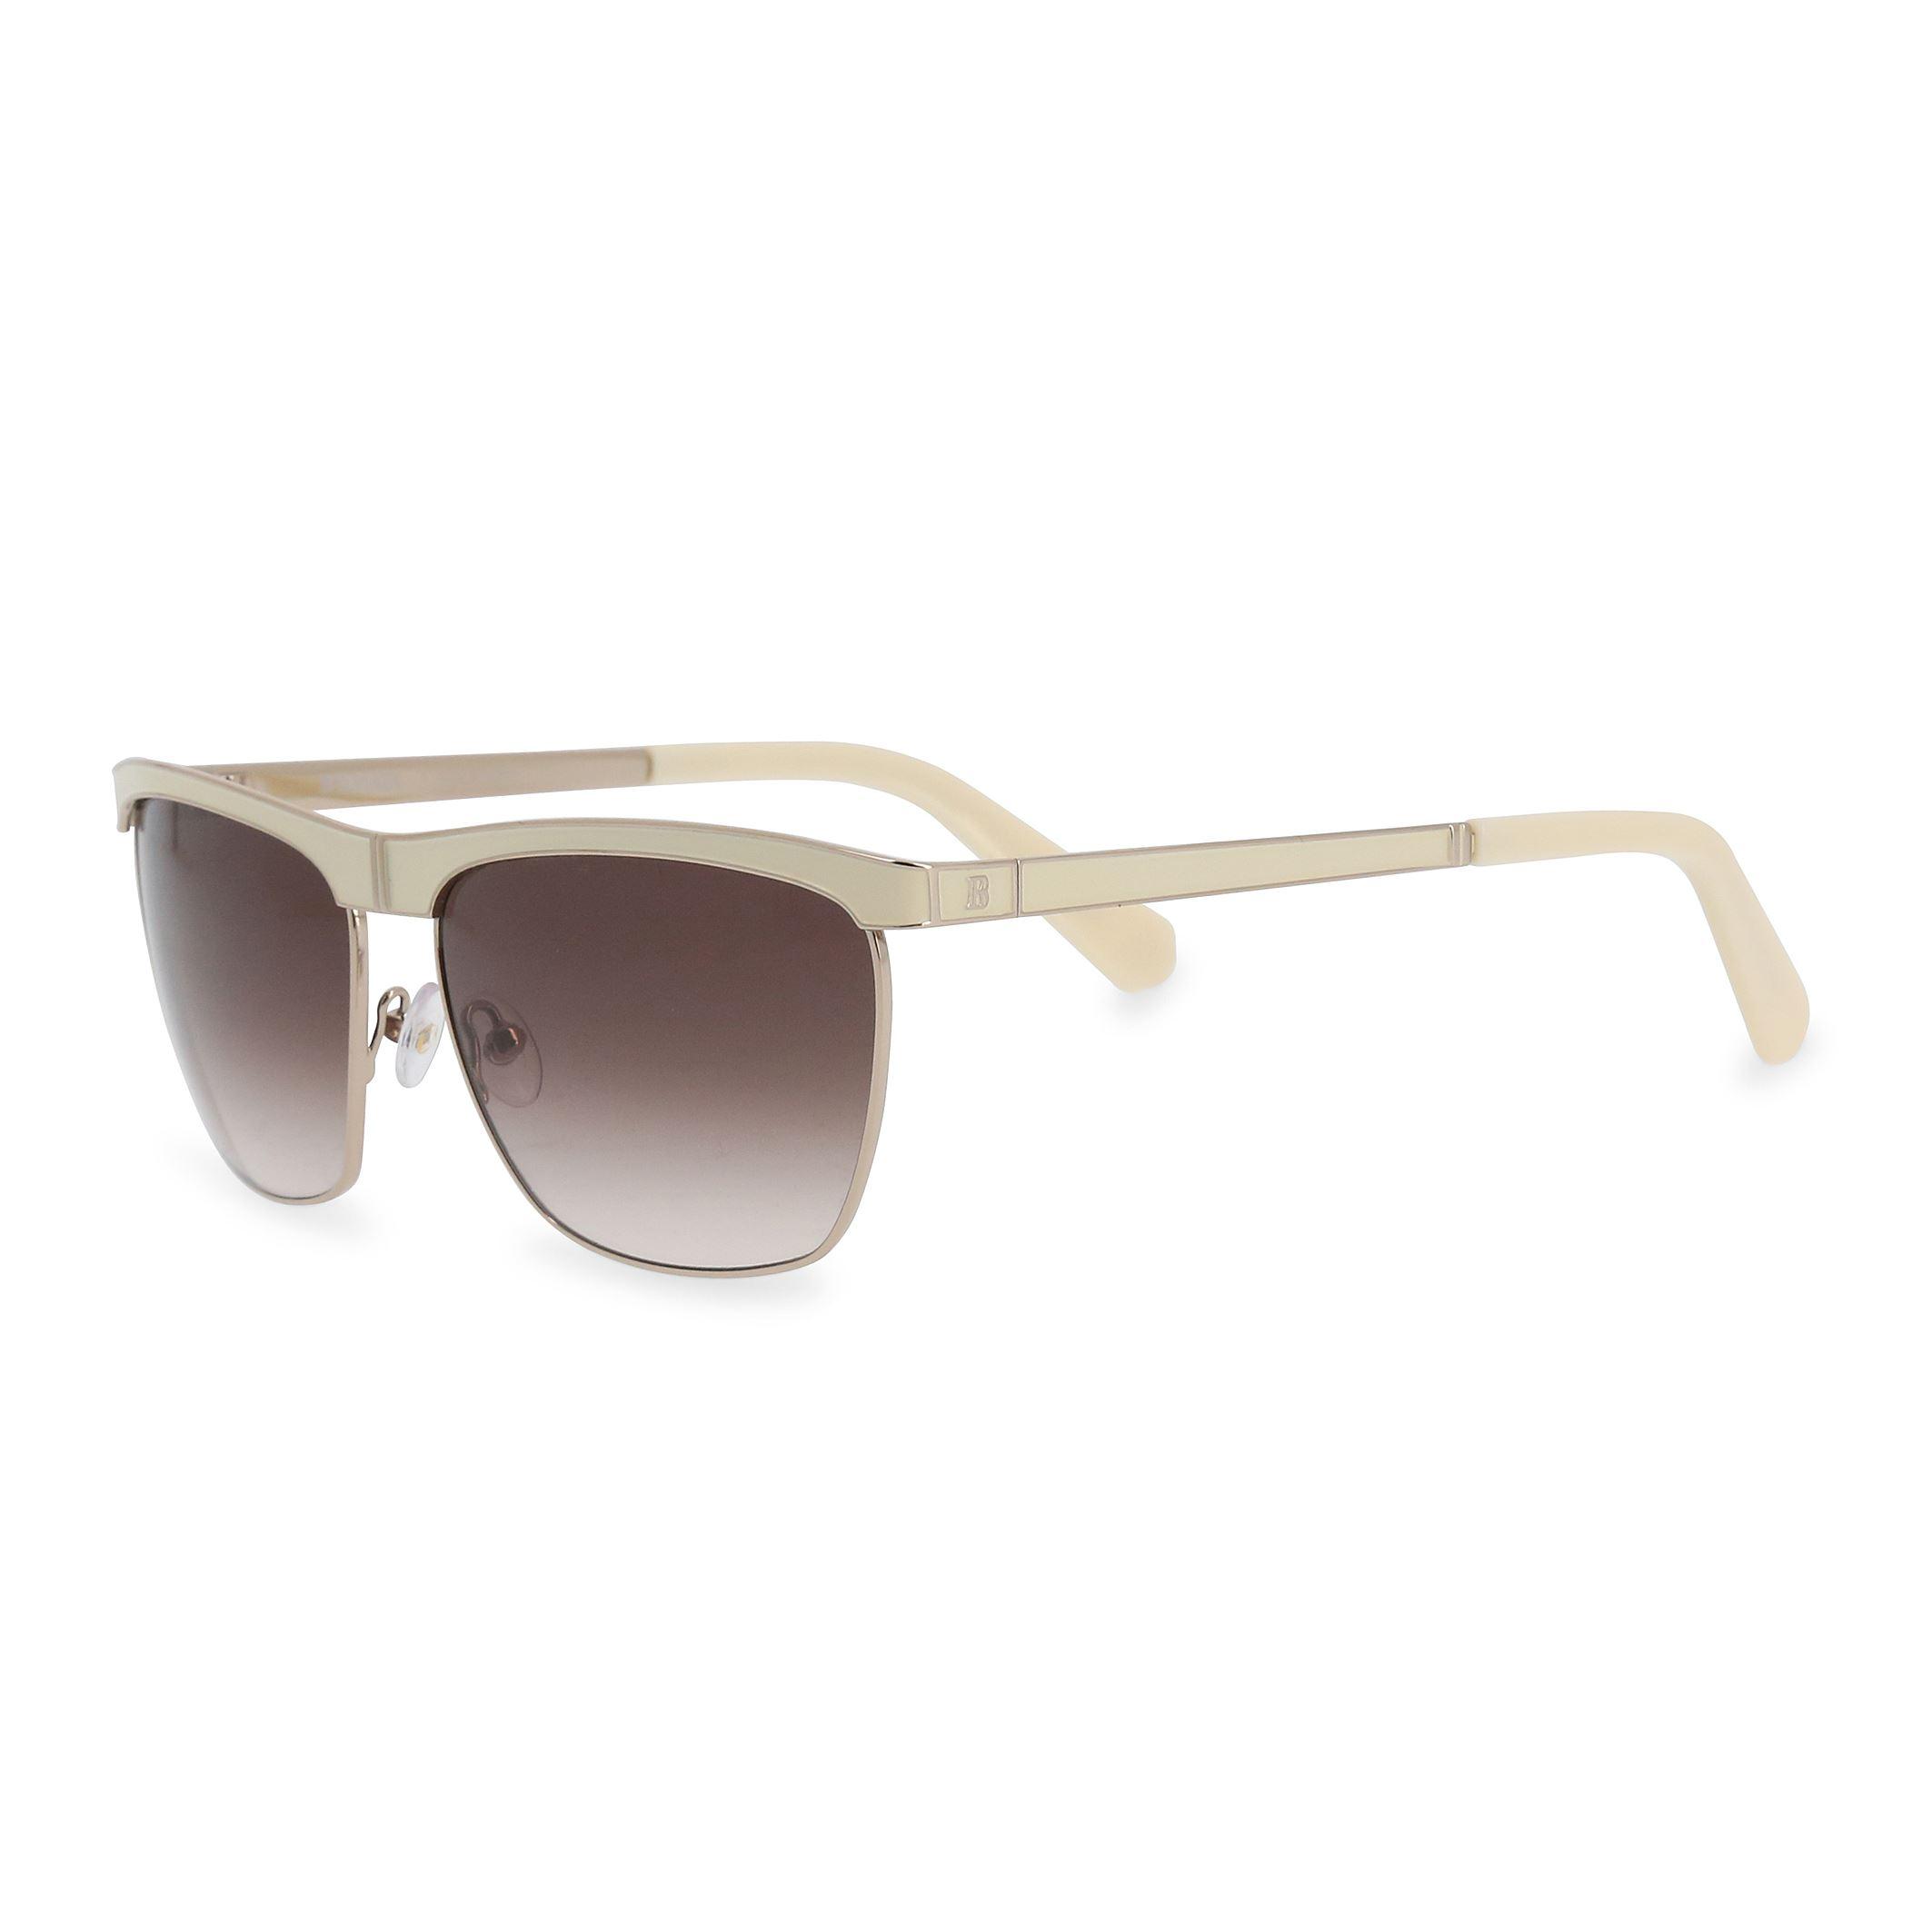 c288d5e4ae12 Details about Balmain Unisex Square Sunglasses White Metal Frame UV2  Protection